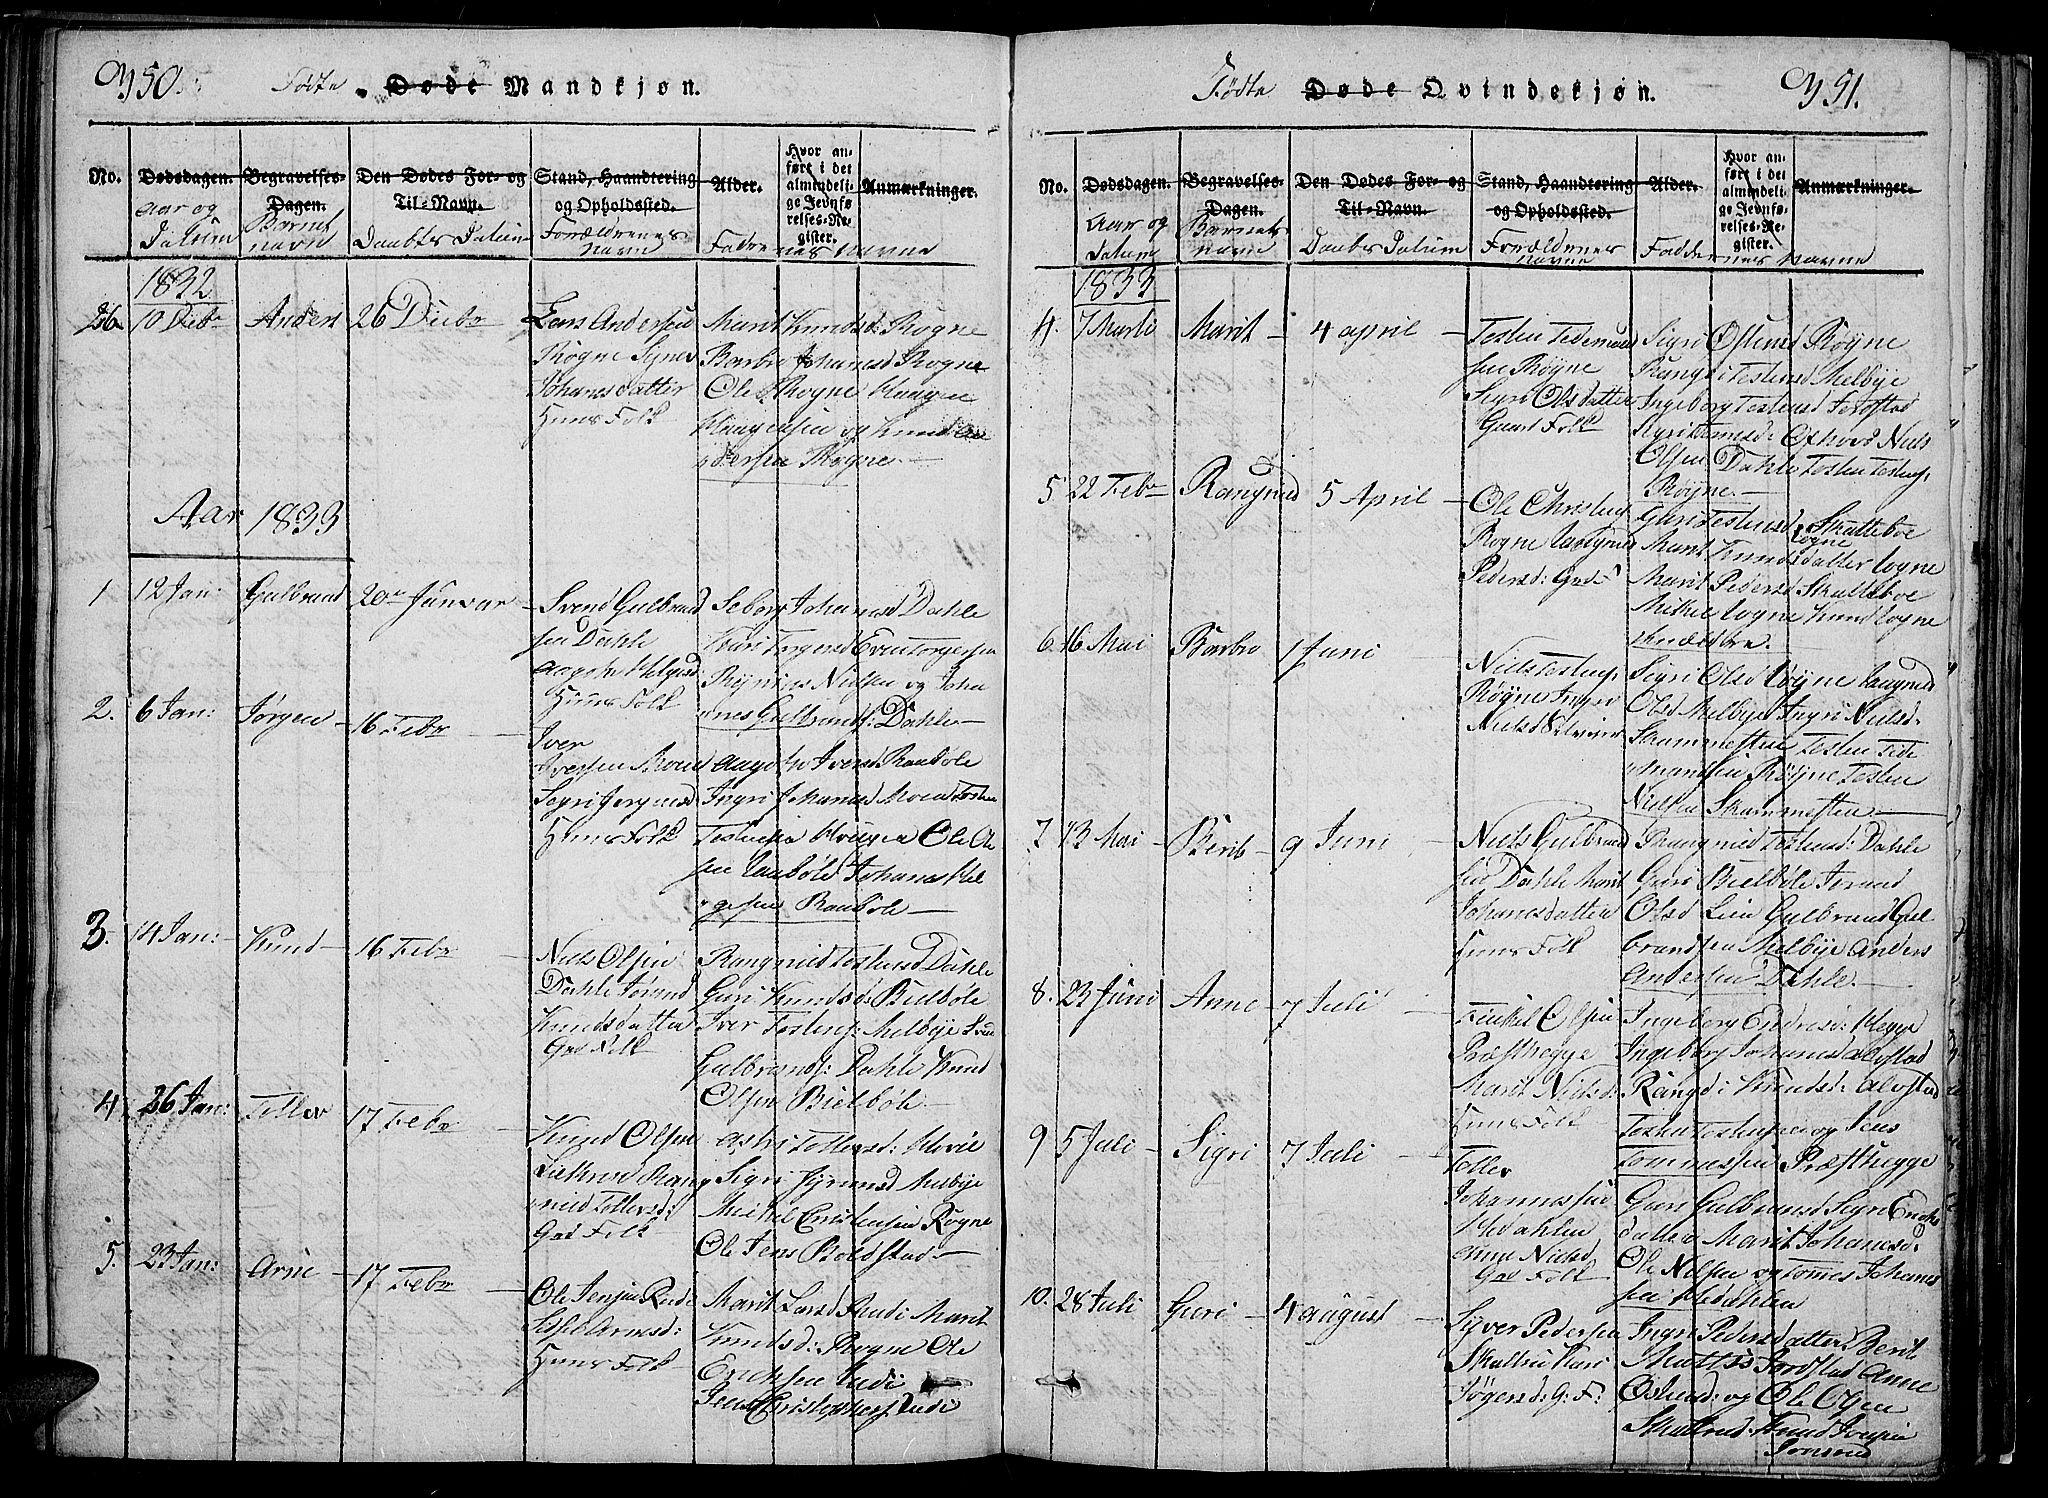 SAH, Slidre prestekontor, Klokkerbok nr. 2, 1814-1839, s. 350-351